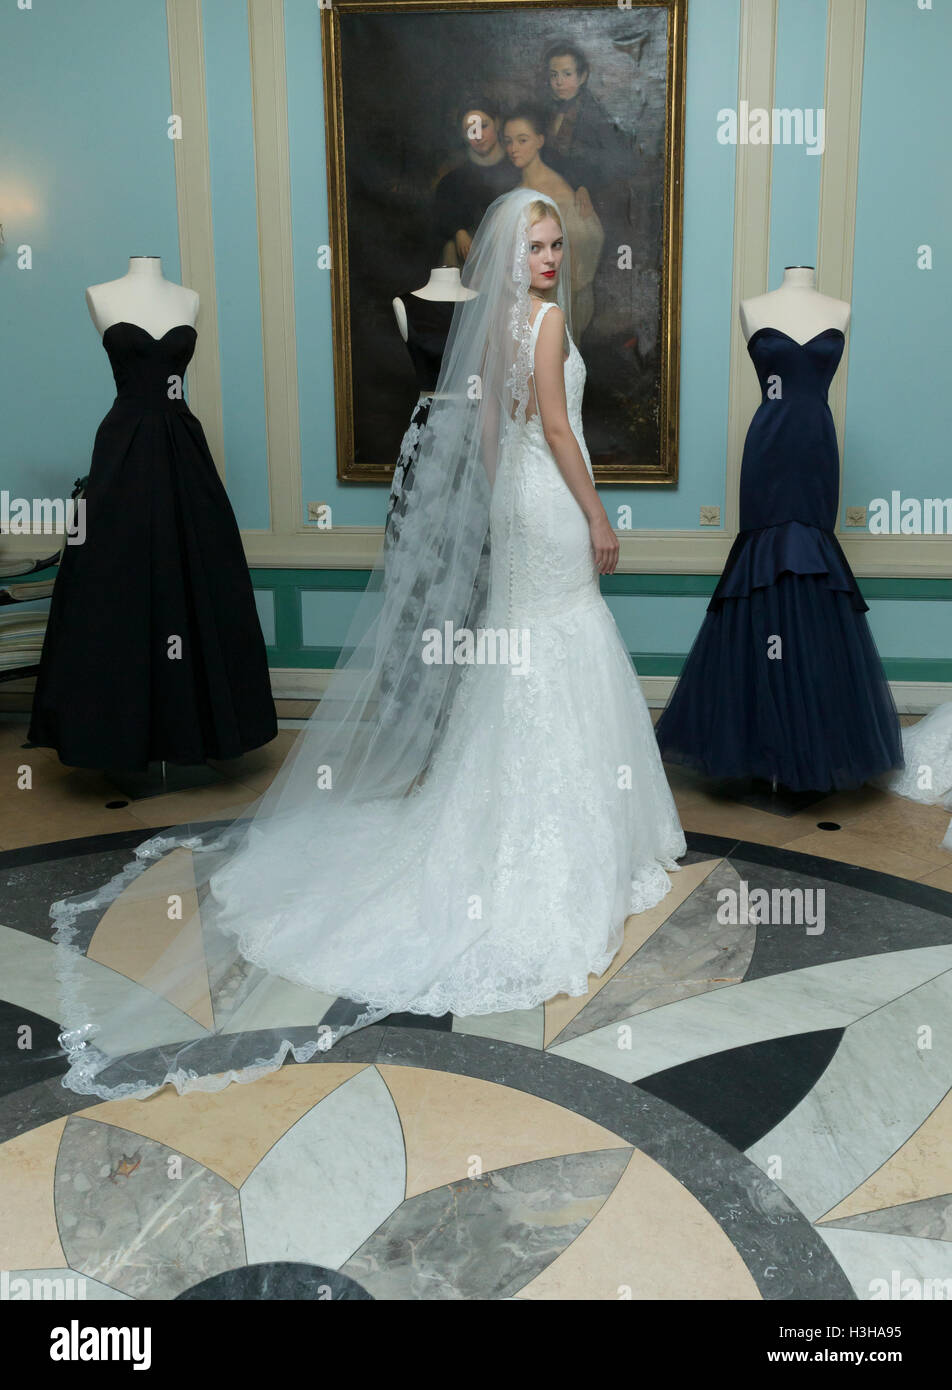 Beautiful Wedding Dresses Utica Ny Image - All Wedding Dresses ...